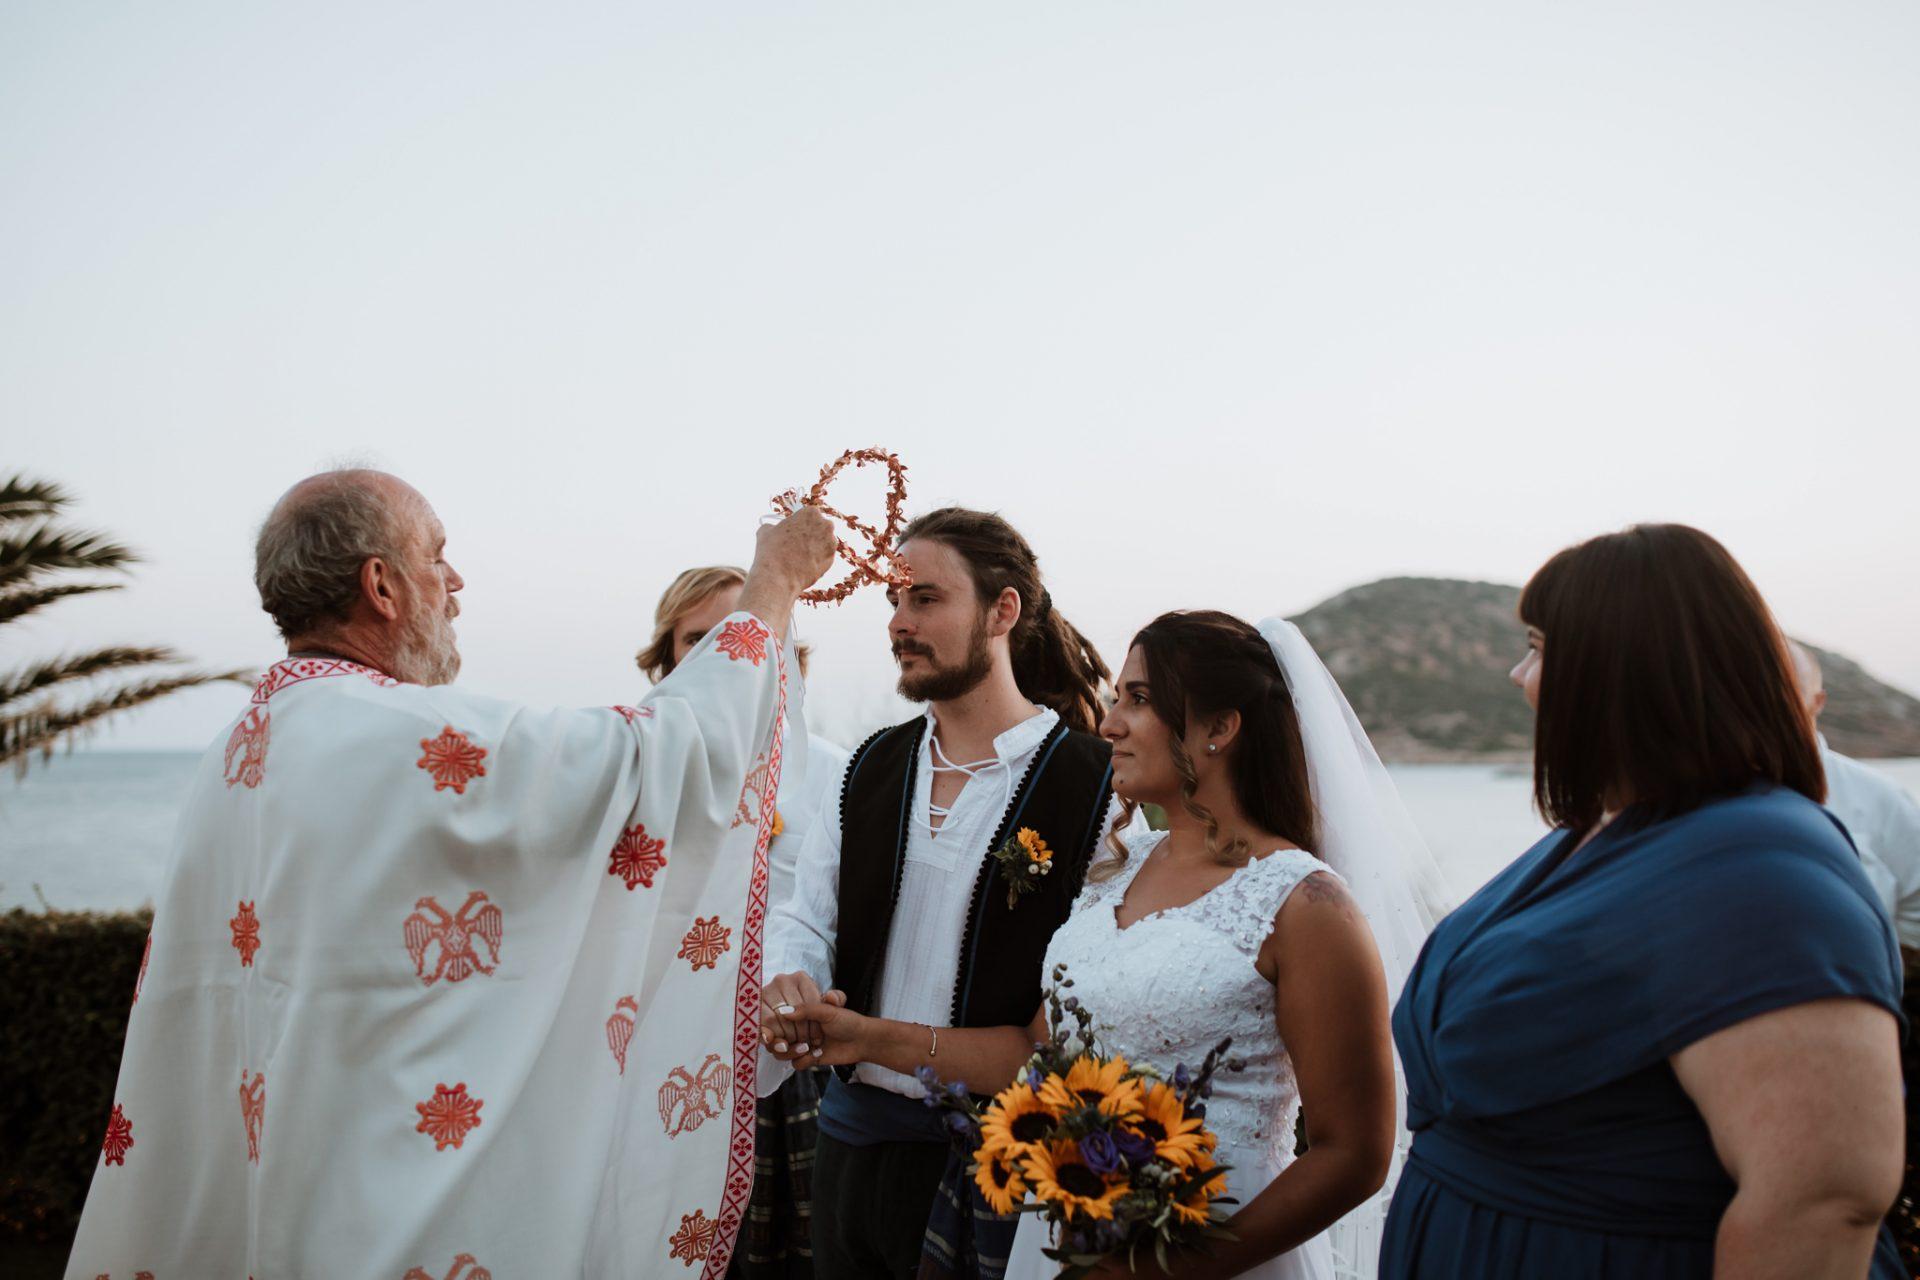 wedding crowns greek orthodox wedding ceremony